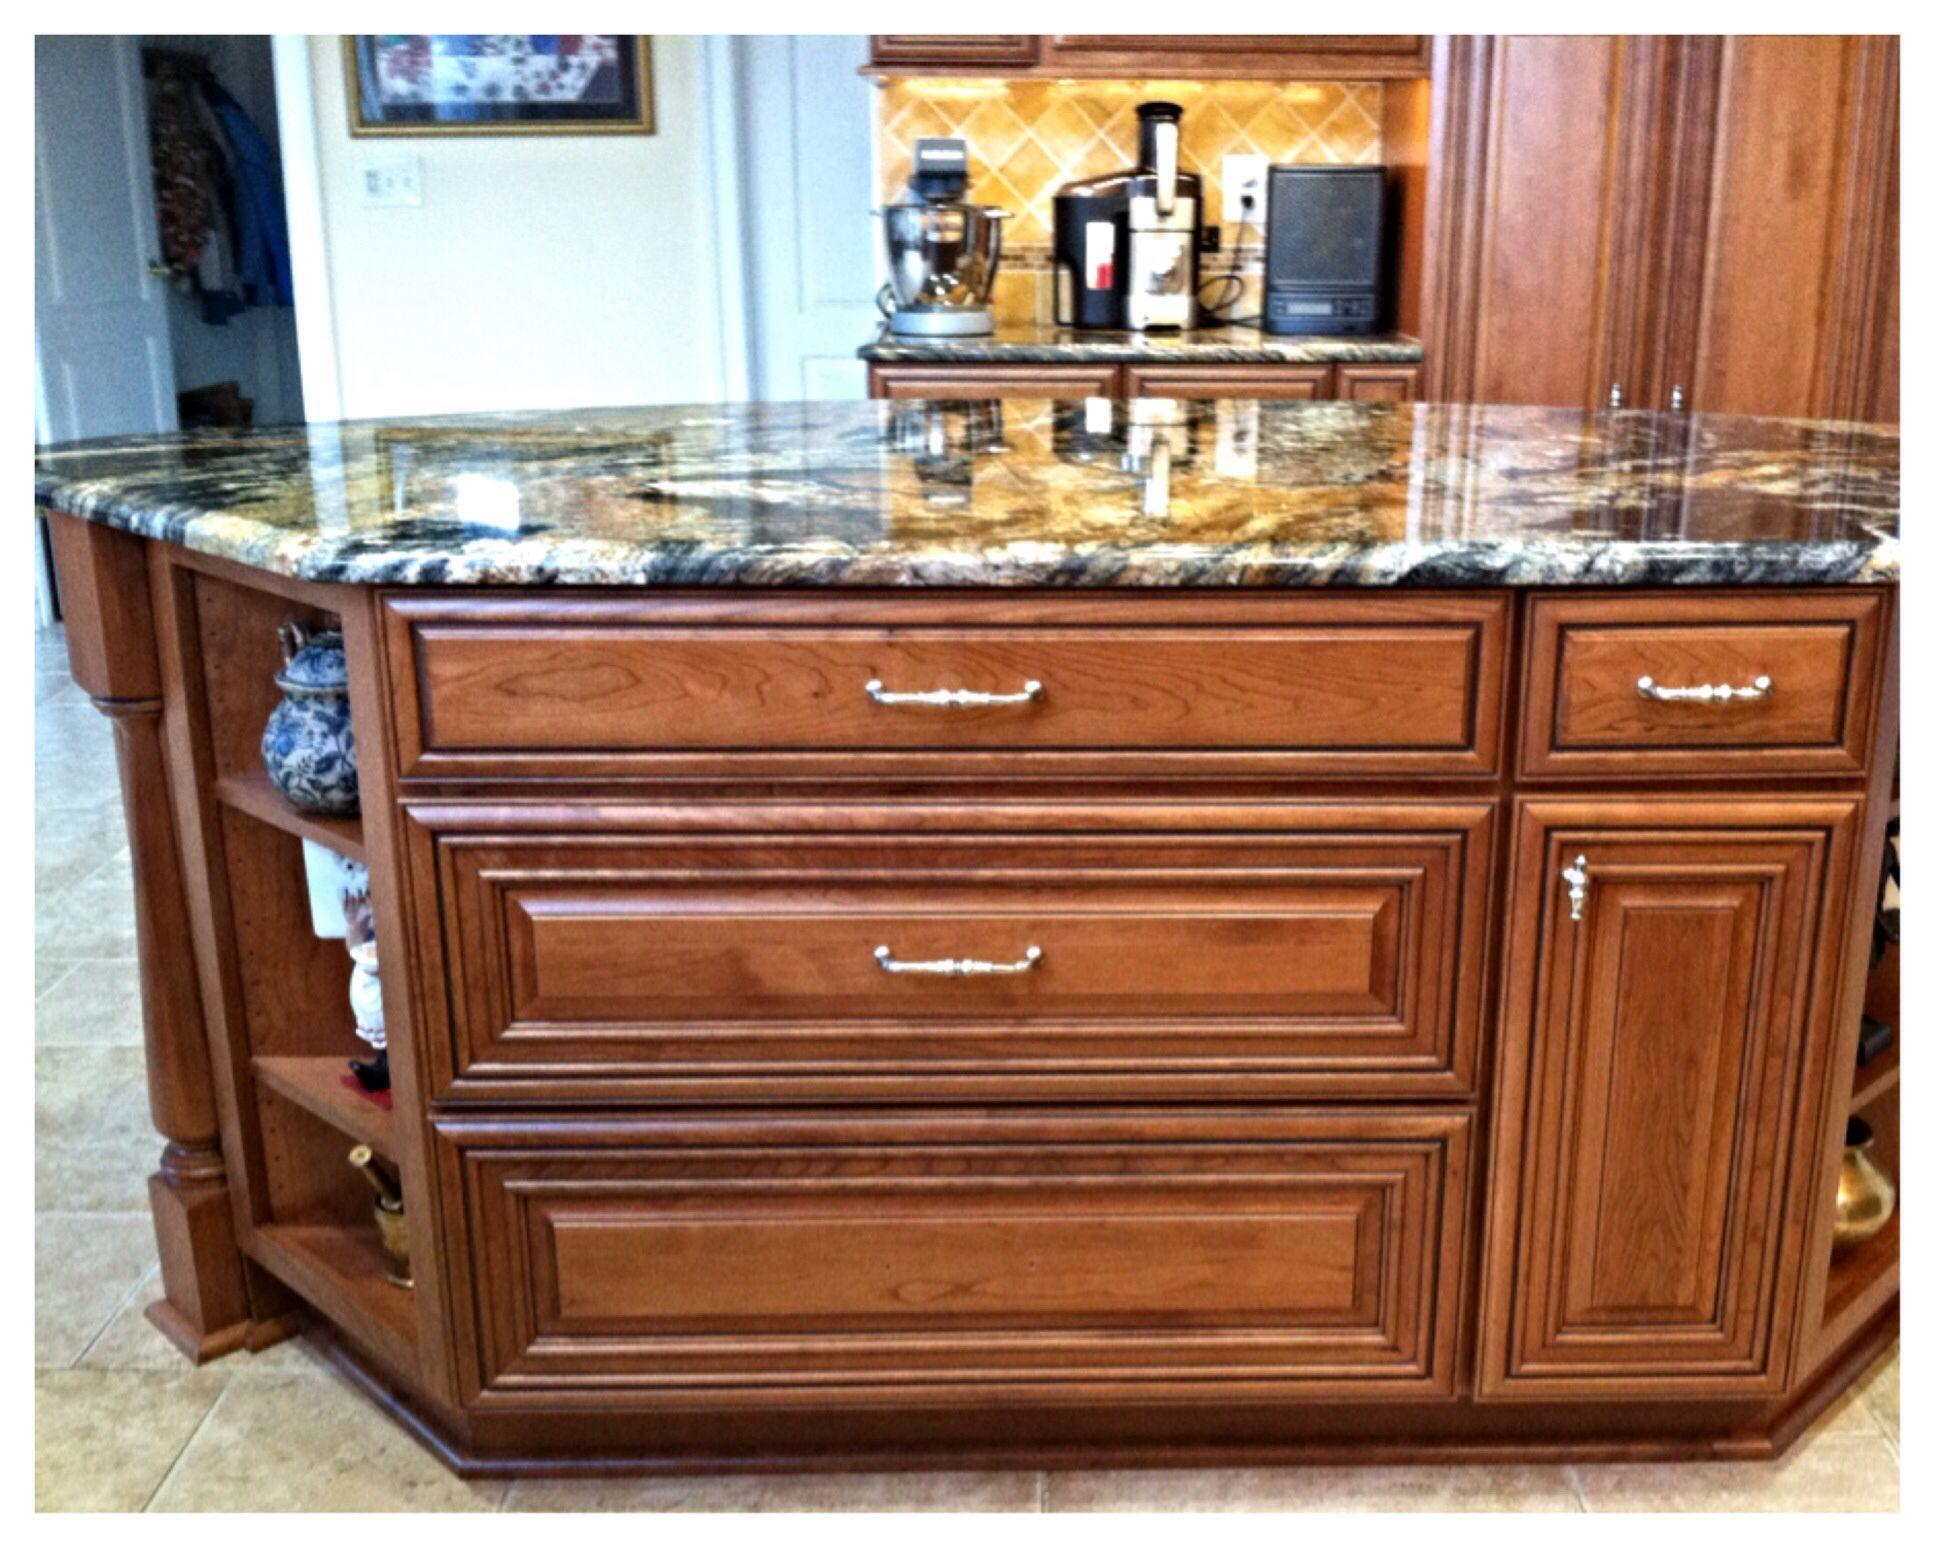 Under island | Kitchen remodel, Cherry cabinets, Onyx tile